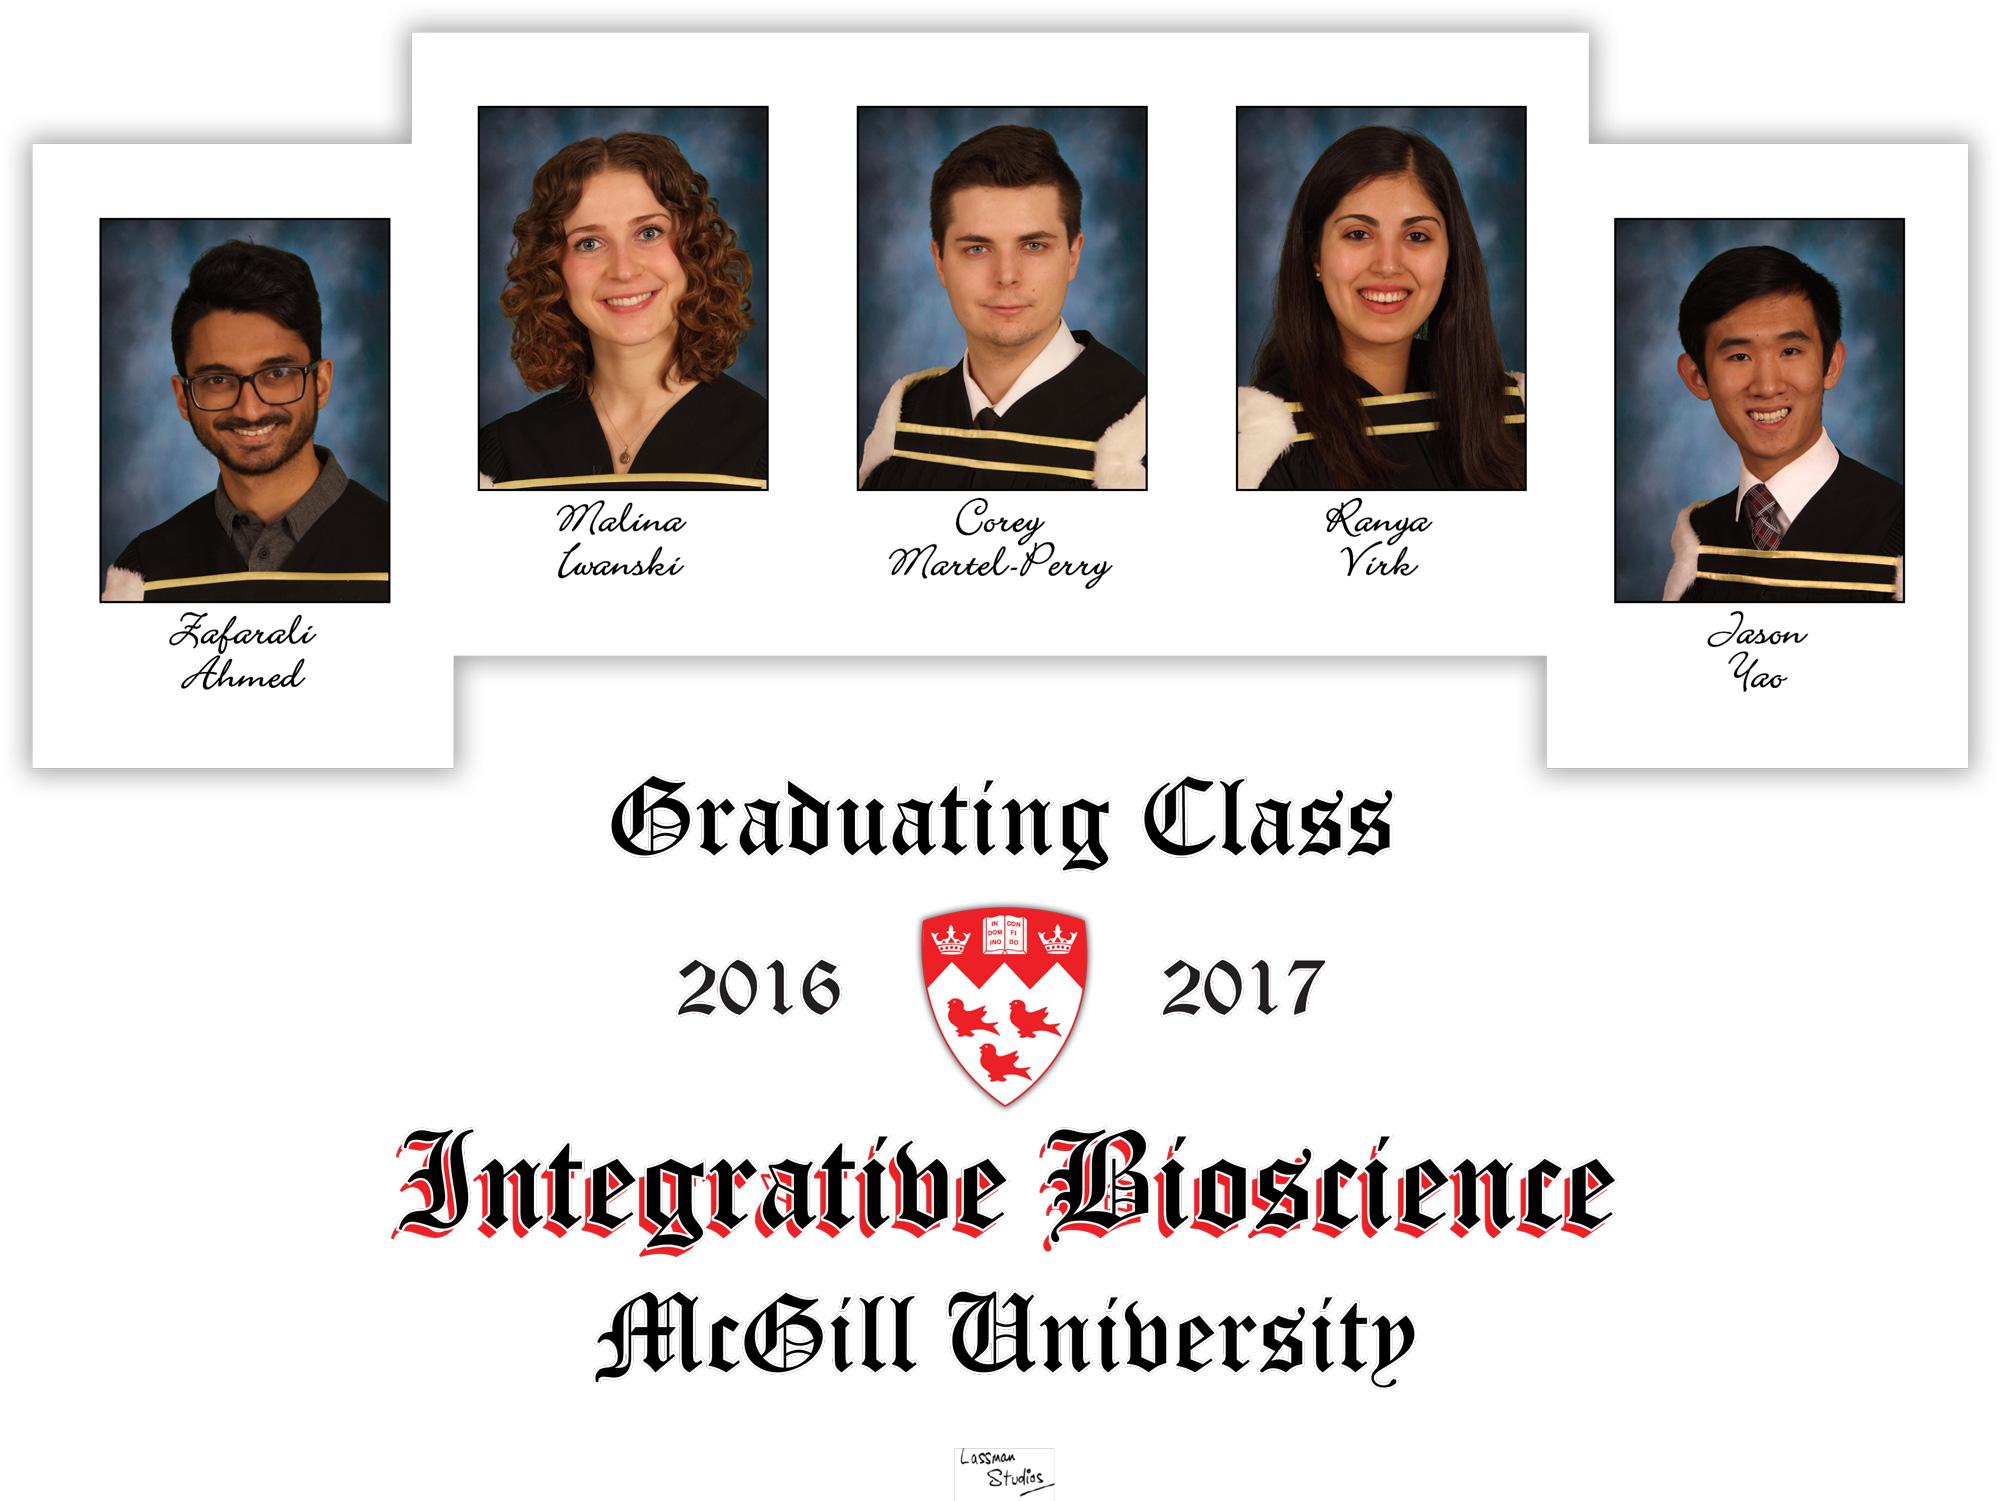 Mosaics-2017-Integrative-Bioscience